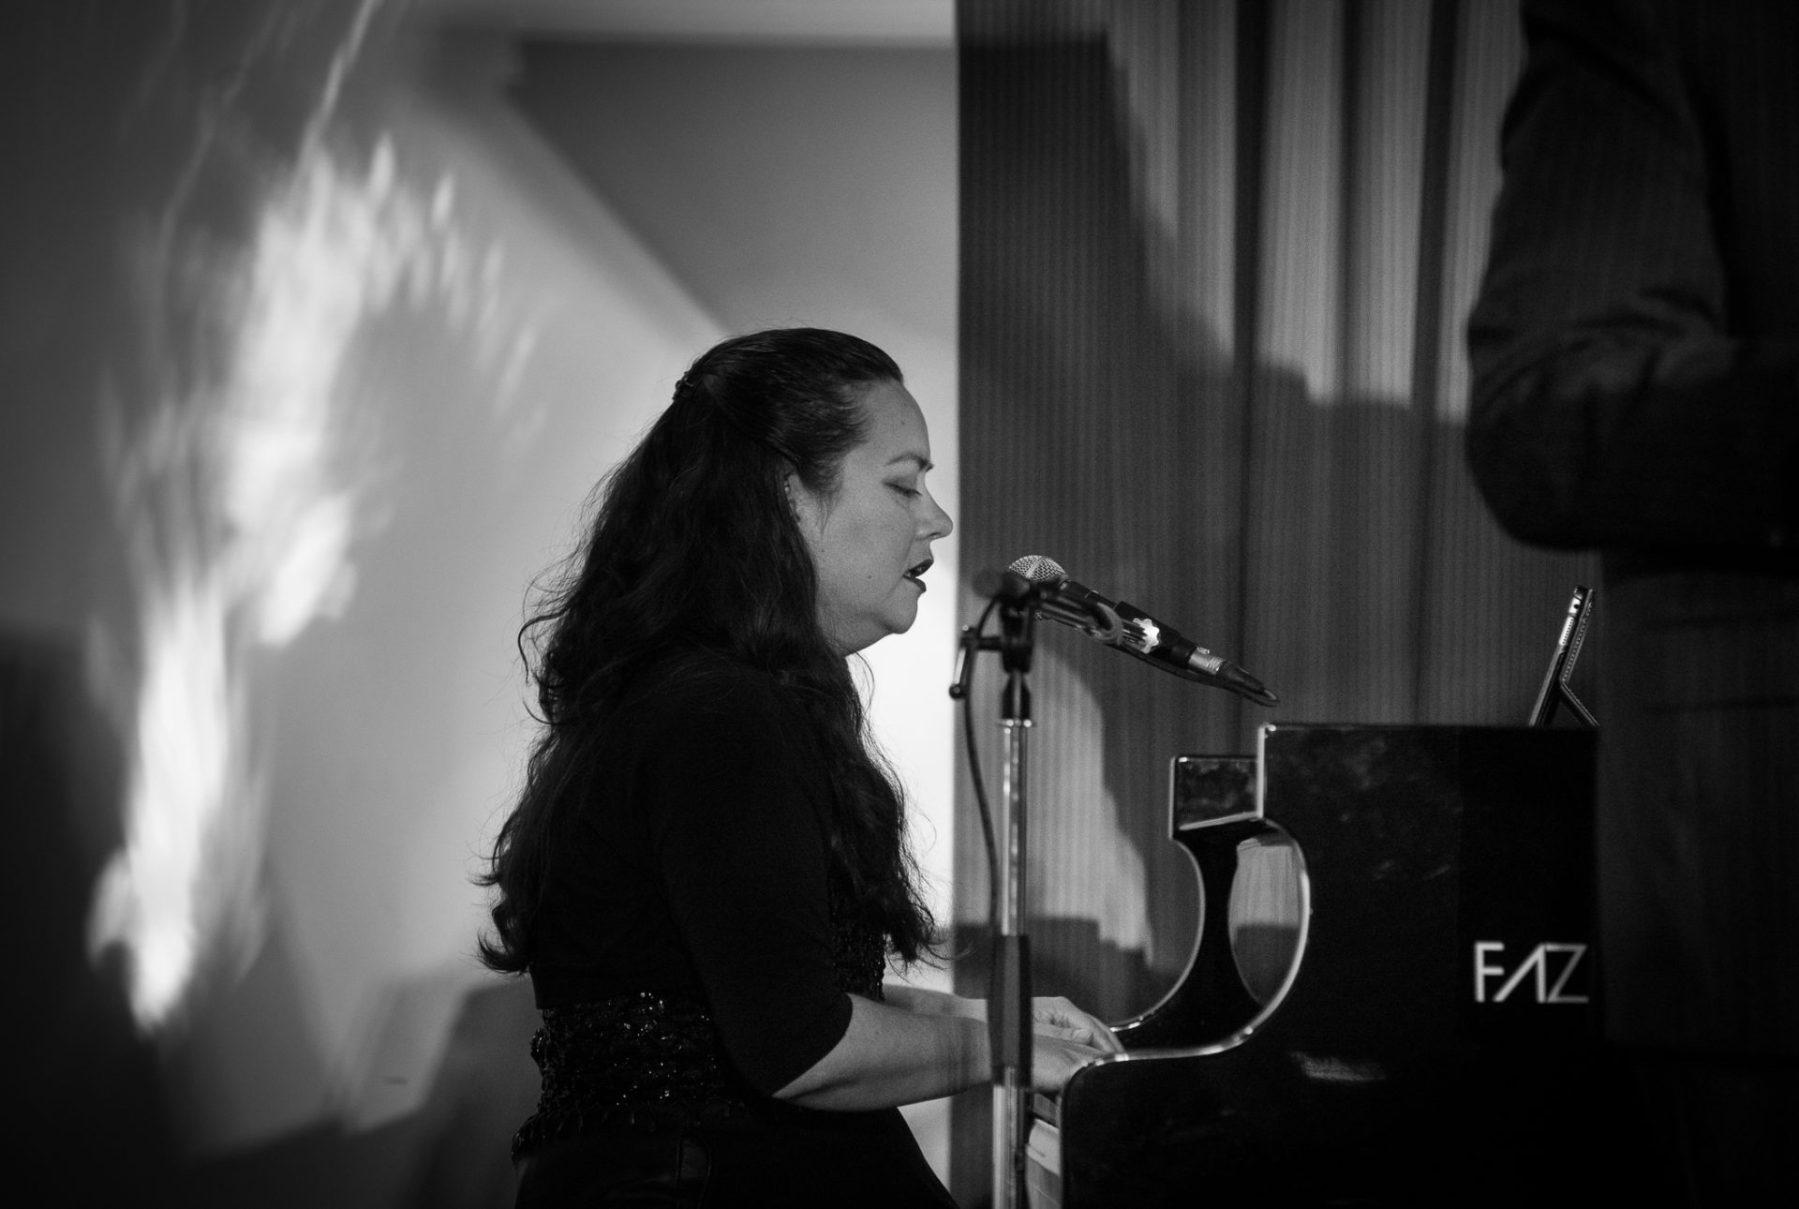 Rachel Kiyo Iwaasa, Music for the Winter Solstice 2017